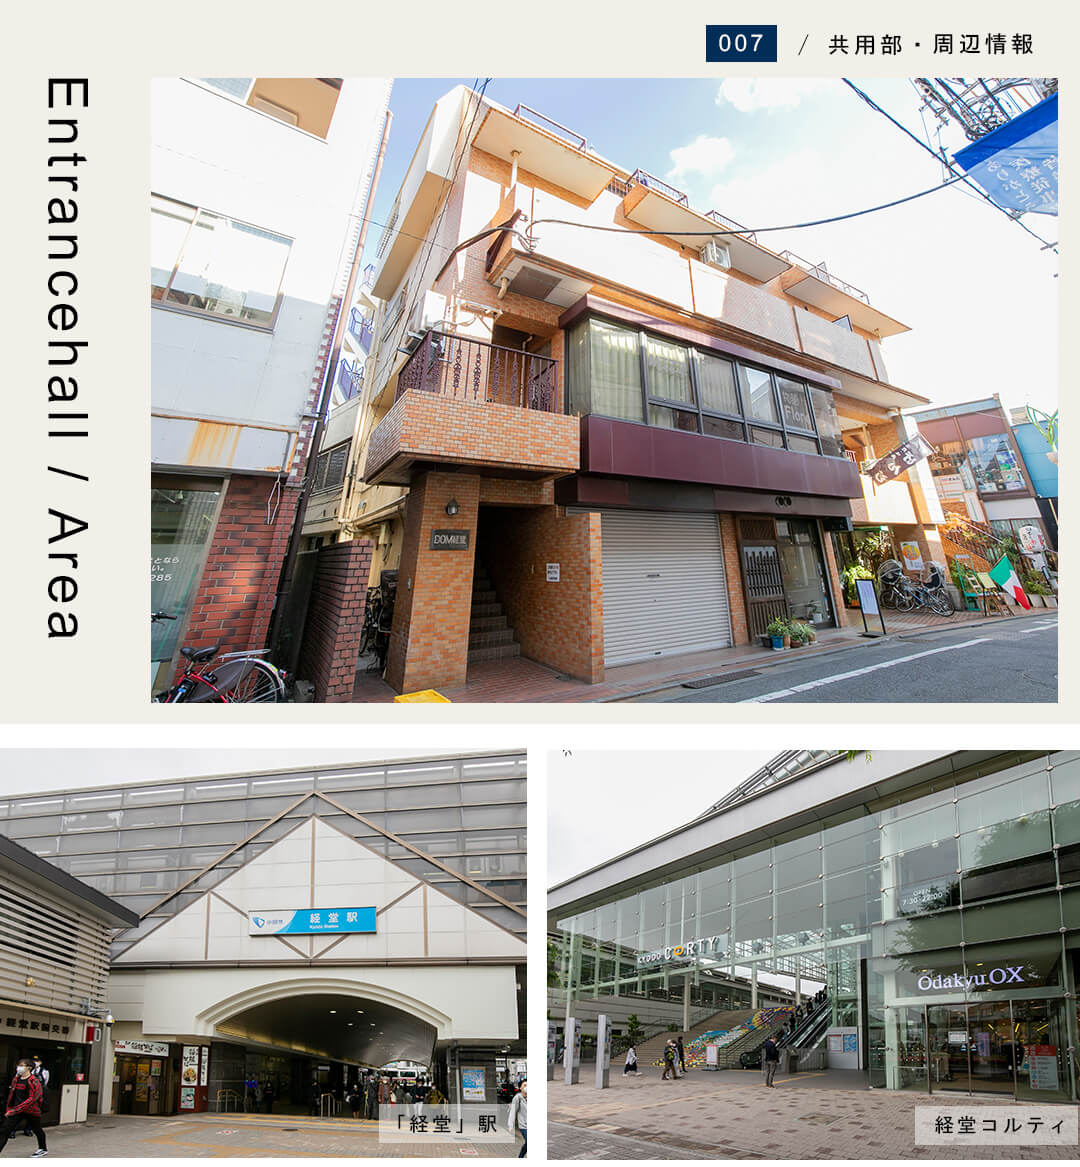 DOM経堂マンションの外観と周辺情報